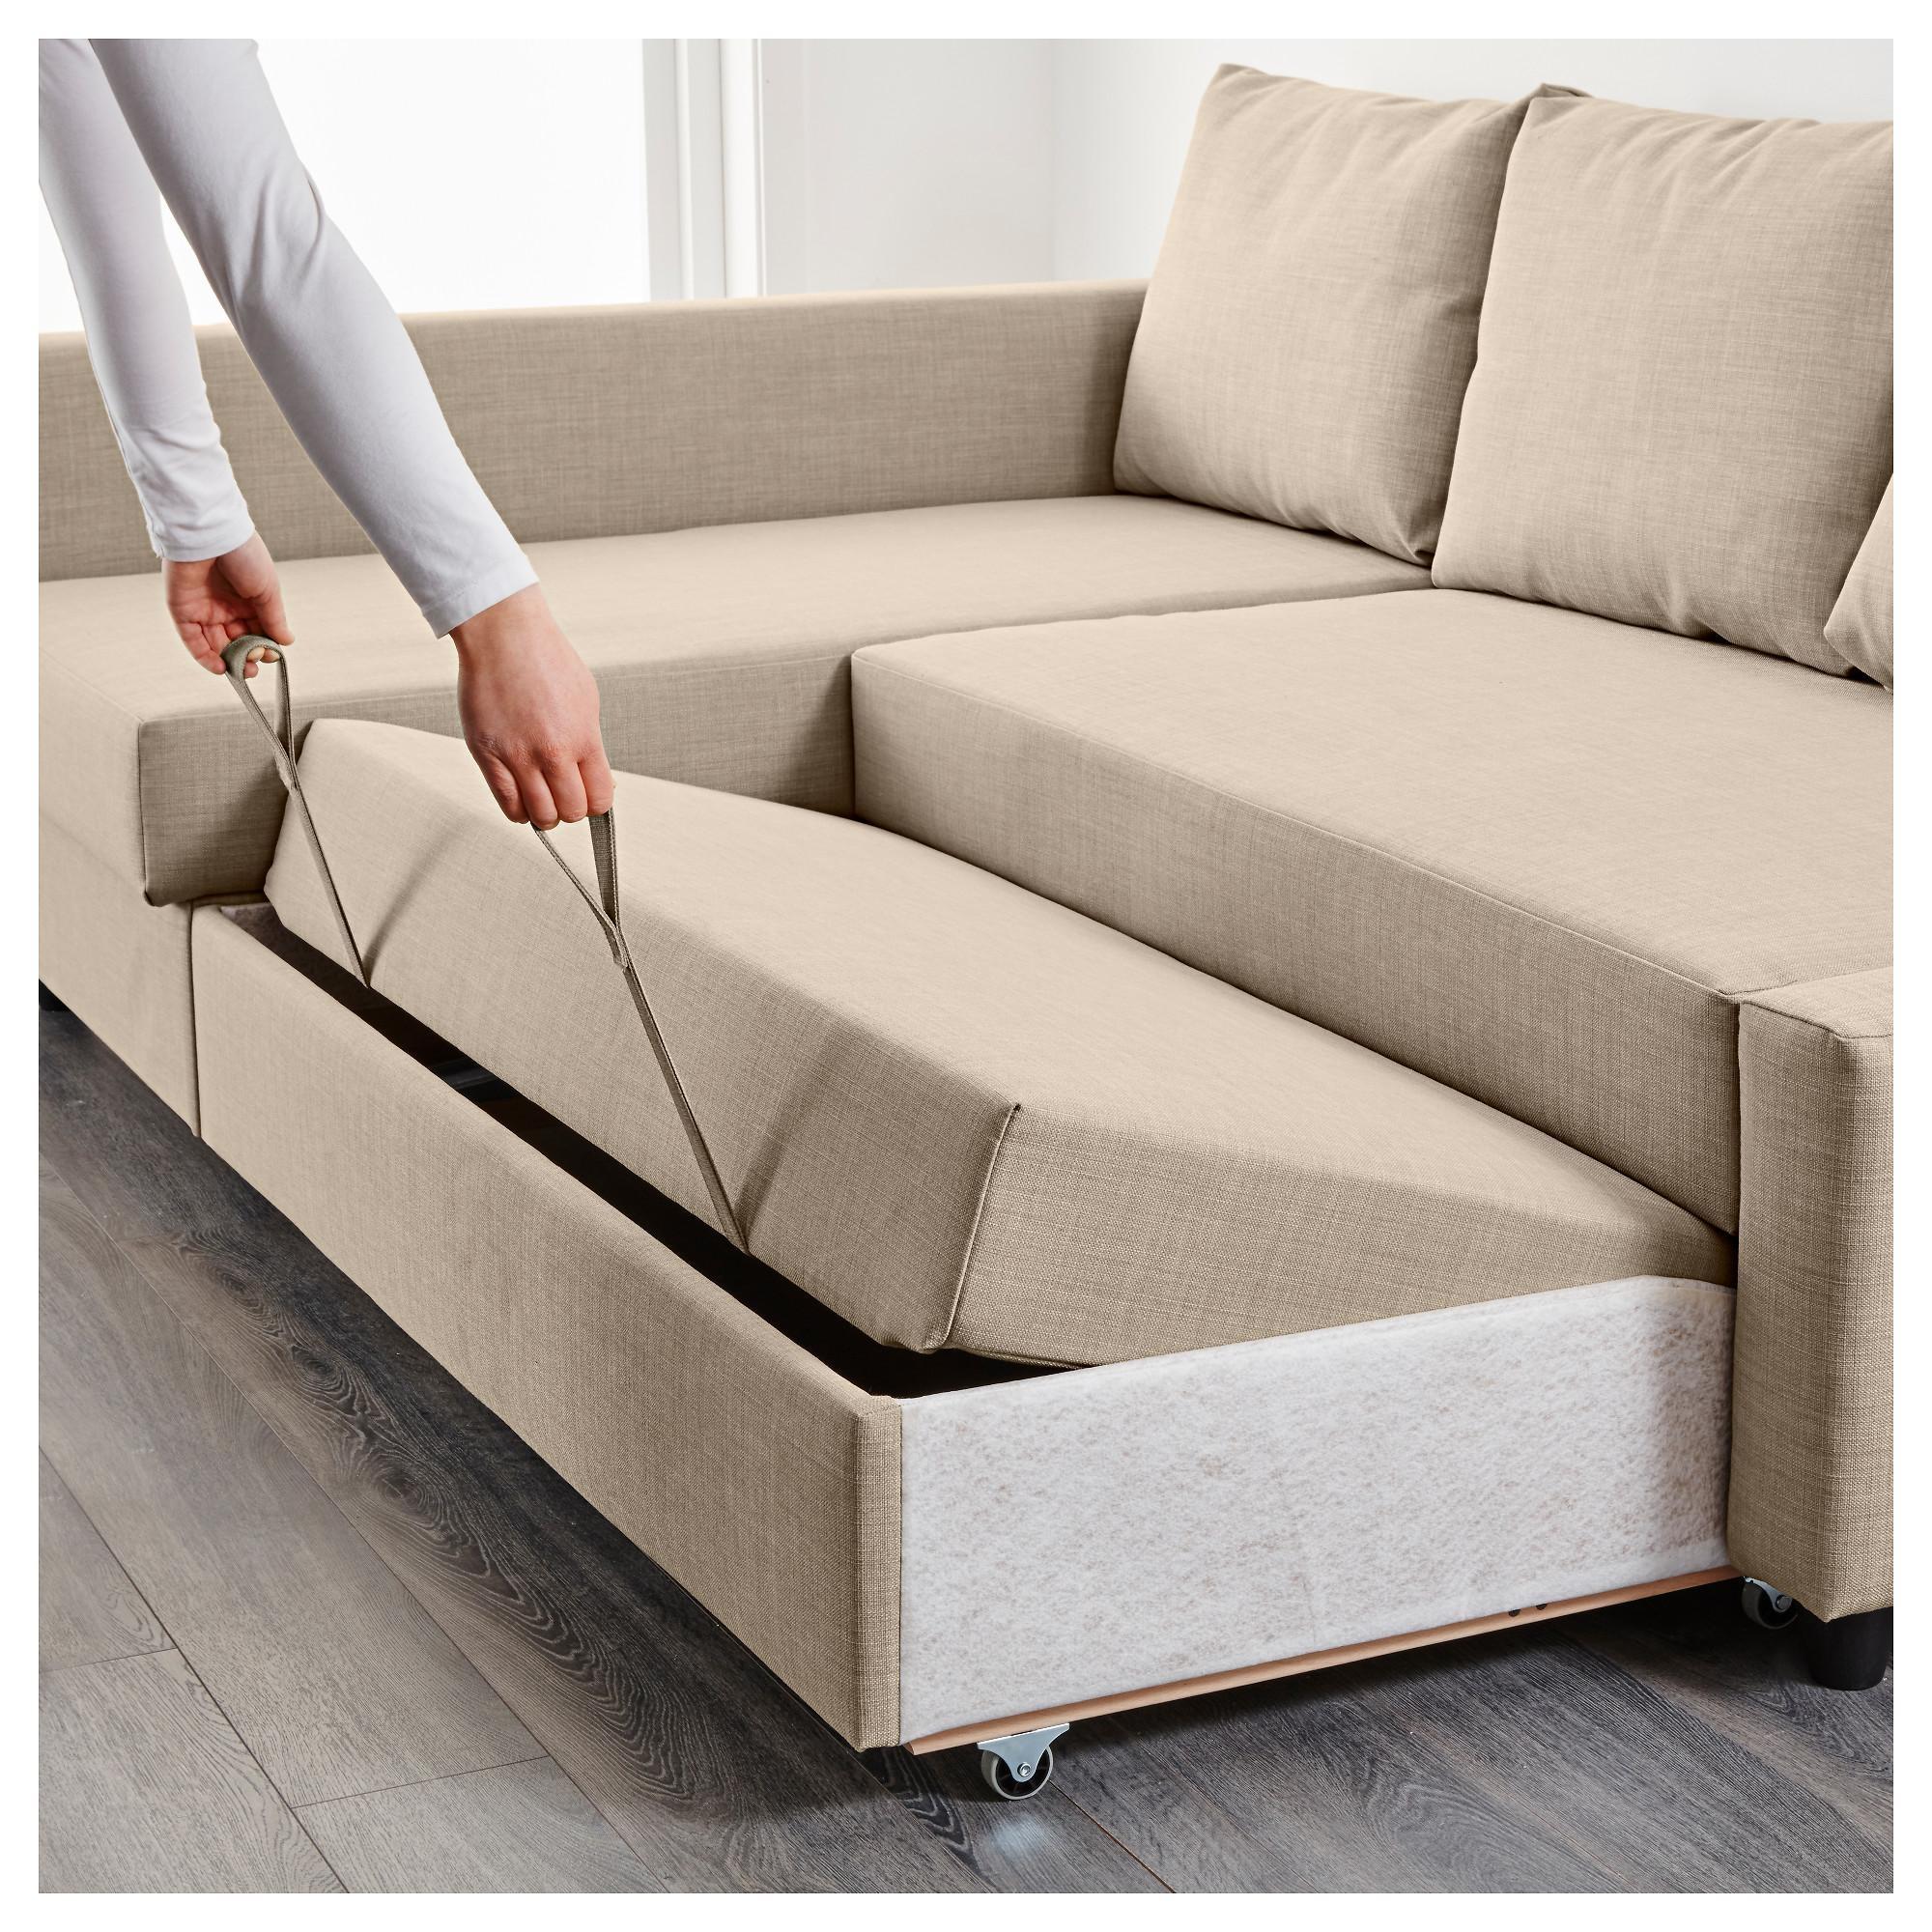 Friheten Corner Sofa Bed With Storage – Skiftebo Dark Gray – Ikea In Corner Sofa Beds (View 10 of 20)